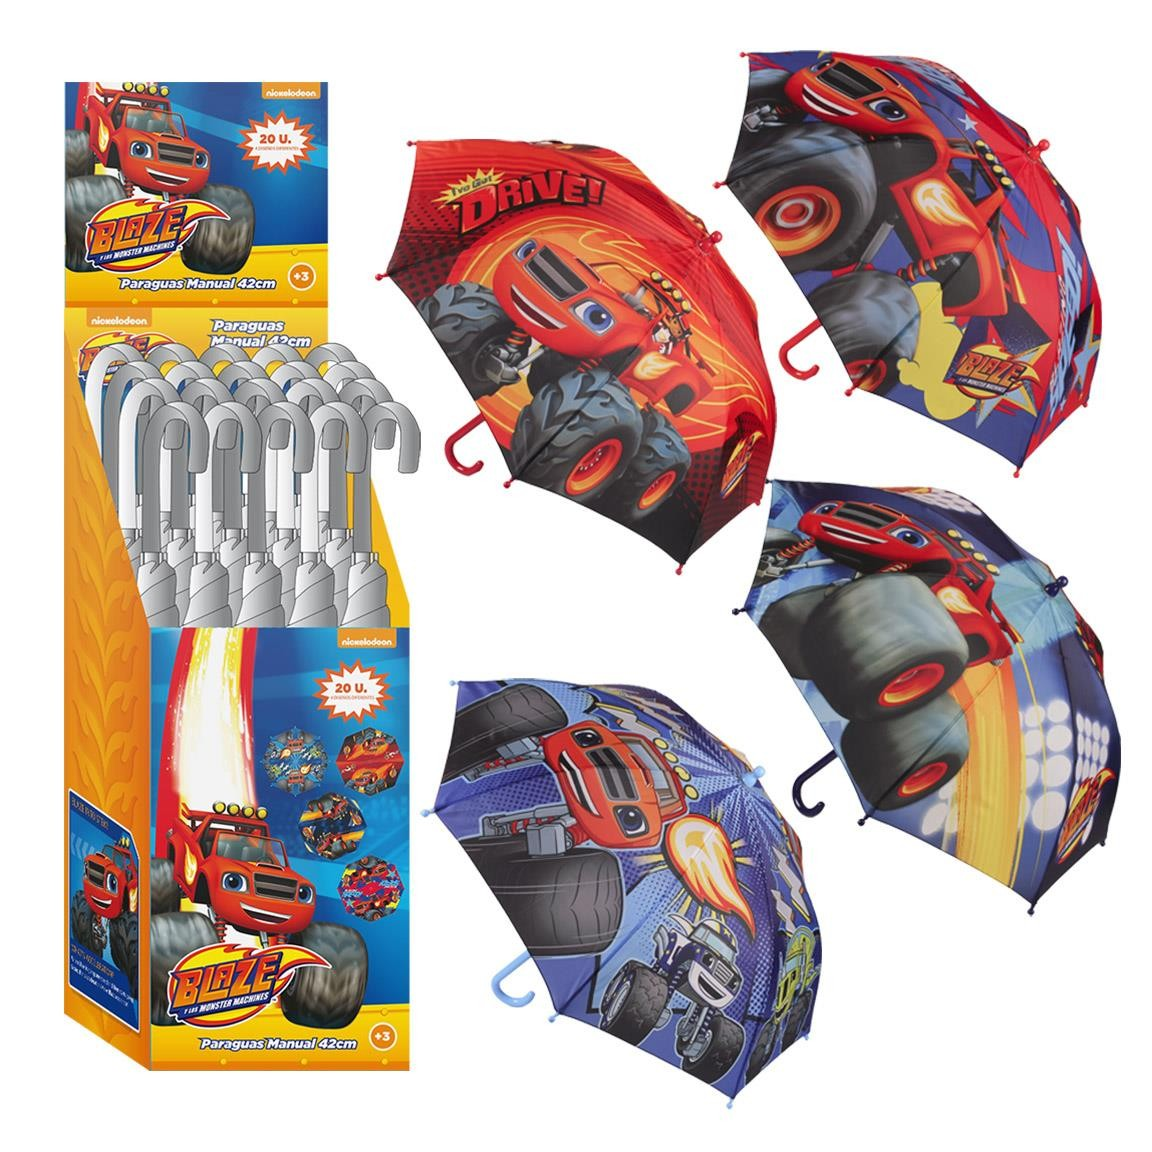 Umbrella Blaze And The Monster Machine Handbook 42cm